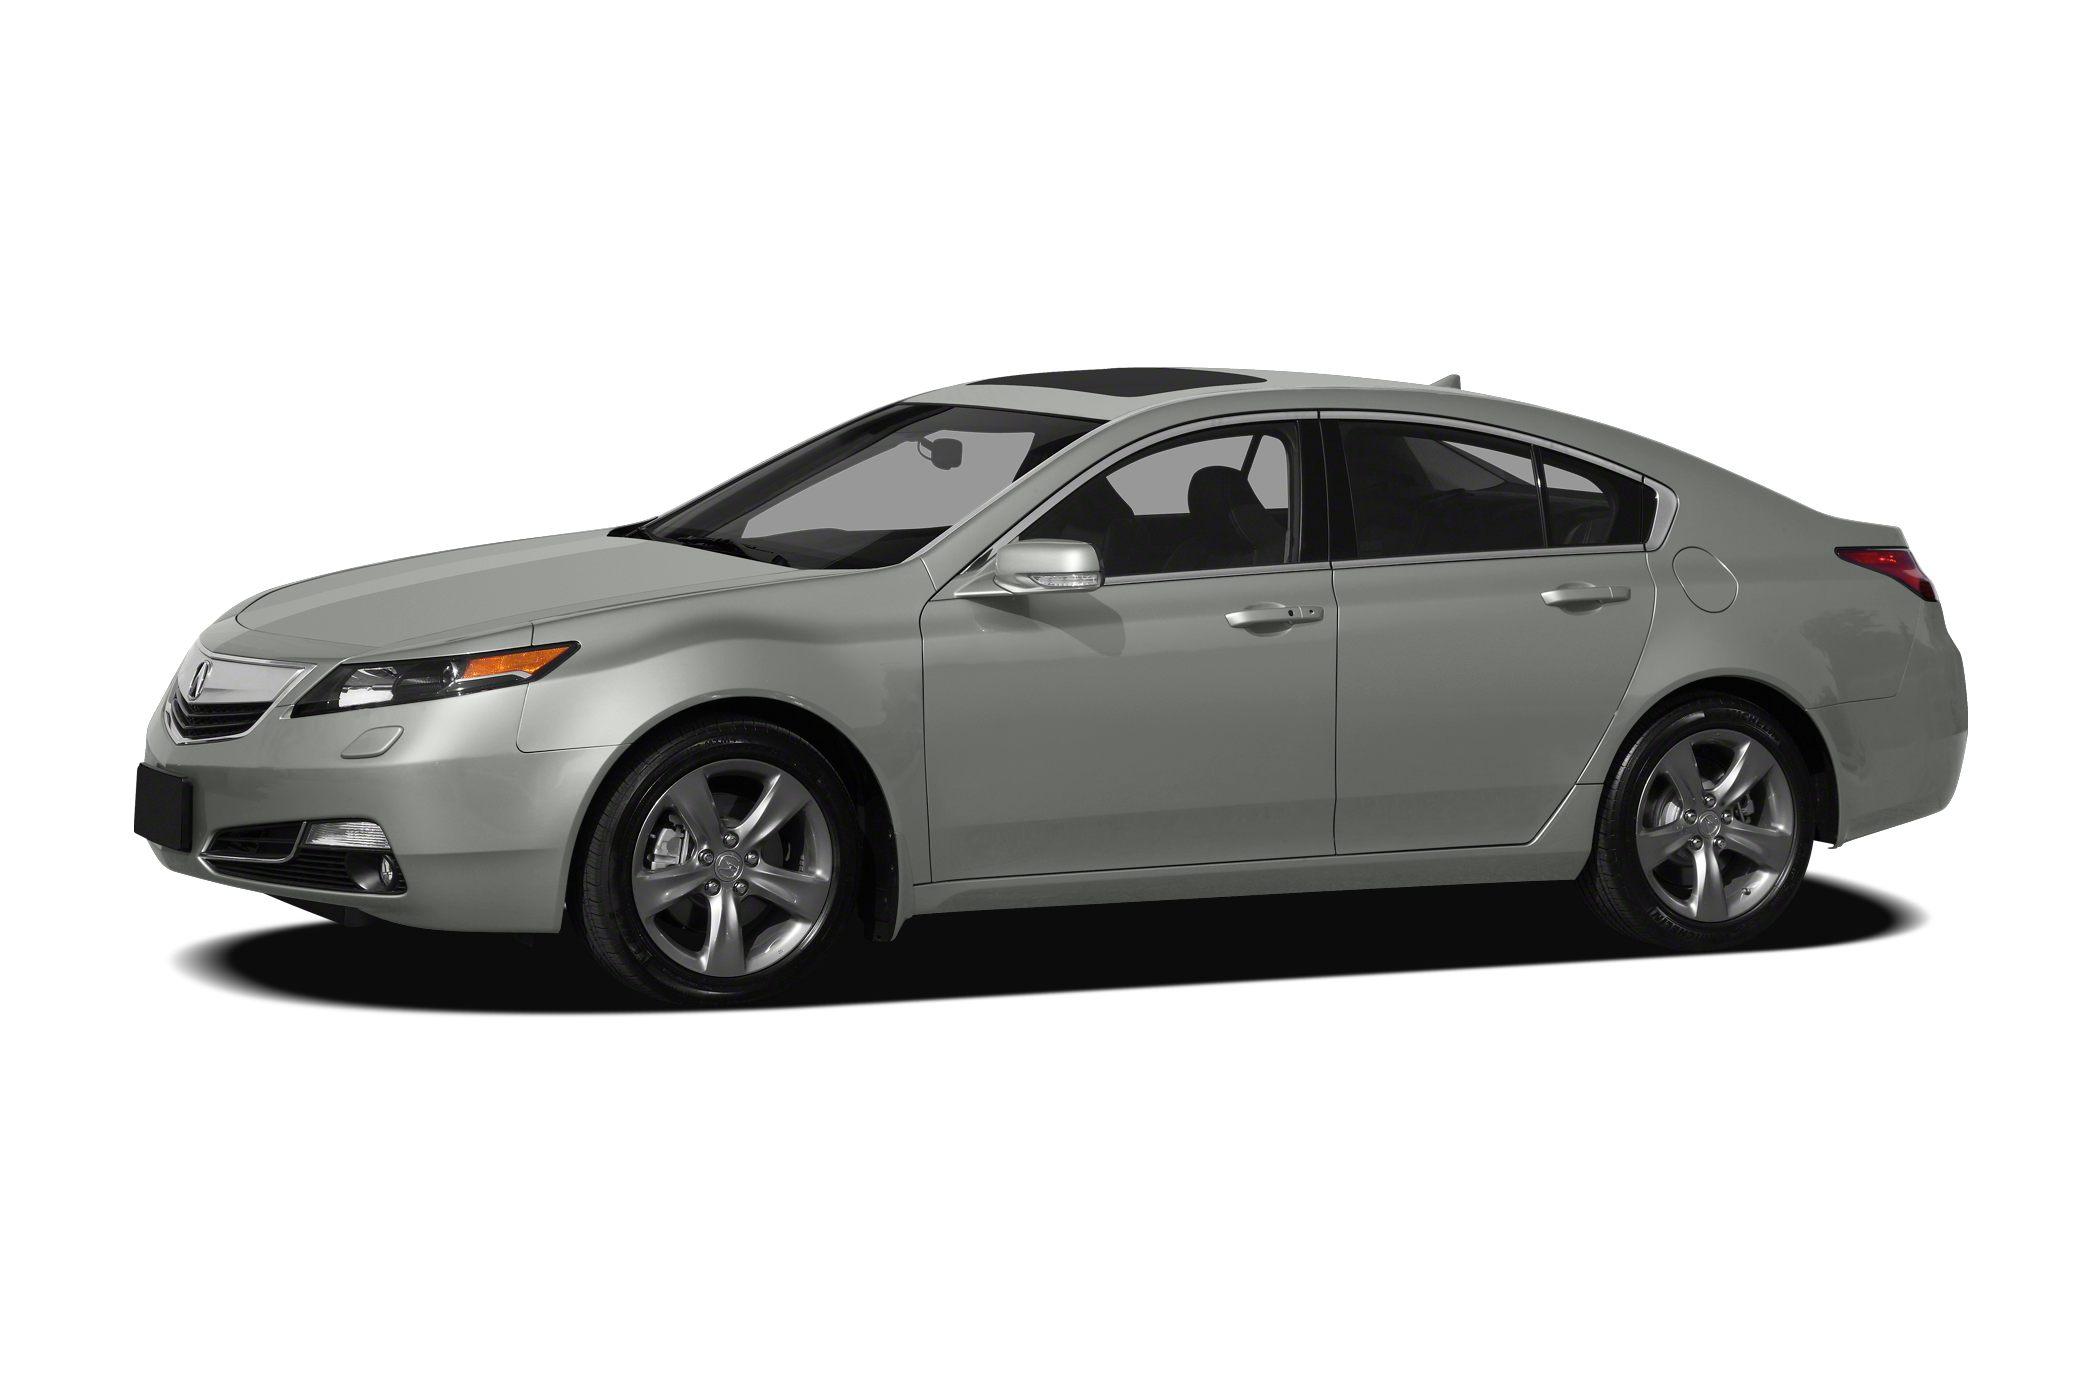 2012 Acura TL Information